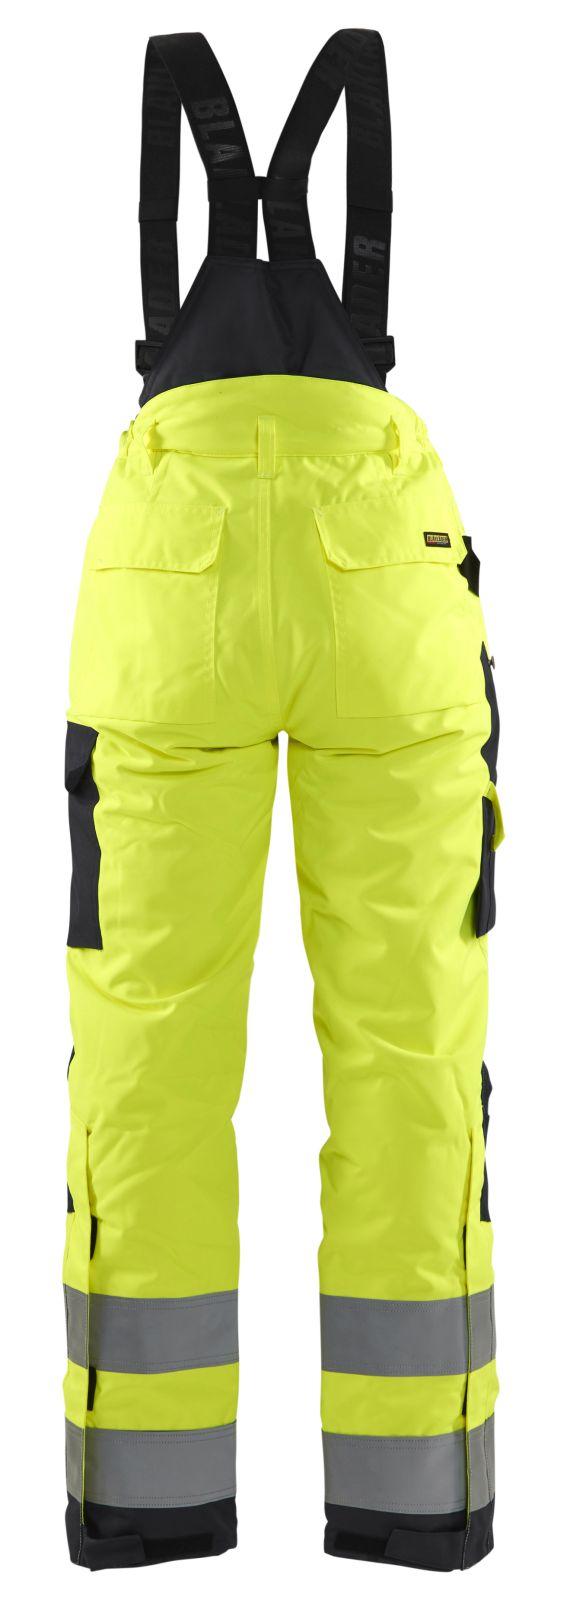 Blaklader Dames winterwerkbroeken 78851977 High Vis geel-zwart(3399)